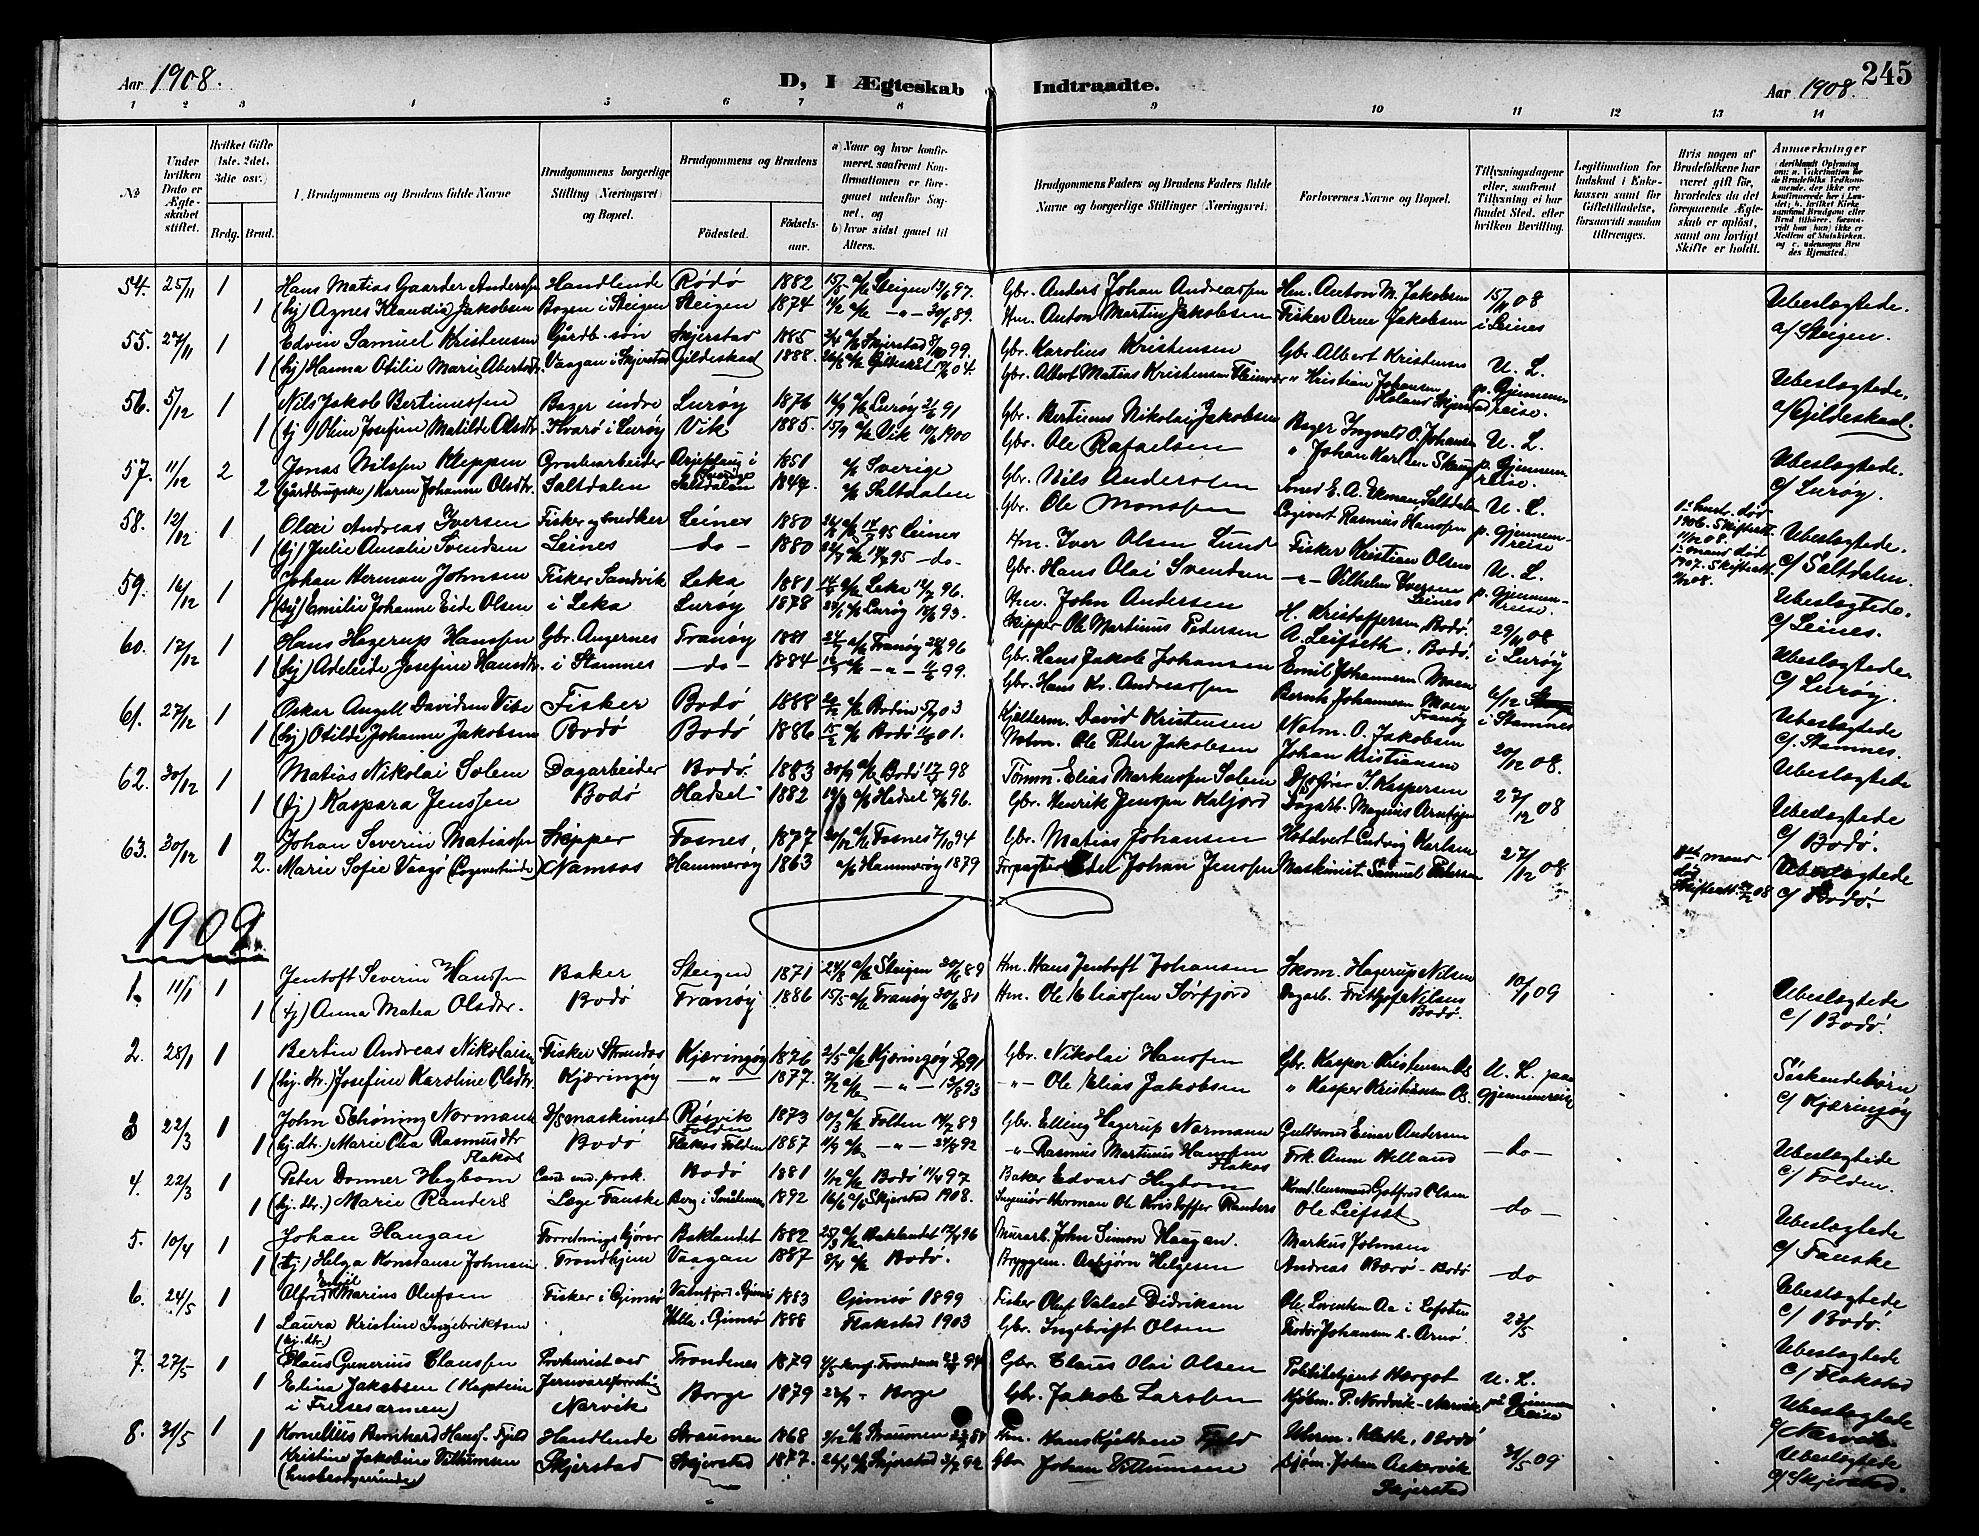 SAT, Ministerialprotokoller, klokkerbøker og fødselsregistre - Nordland, 801/L0033: Klokkerbok nr. 801C08, 1898-1910, s. 245